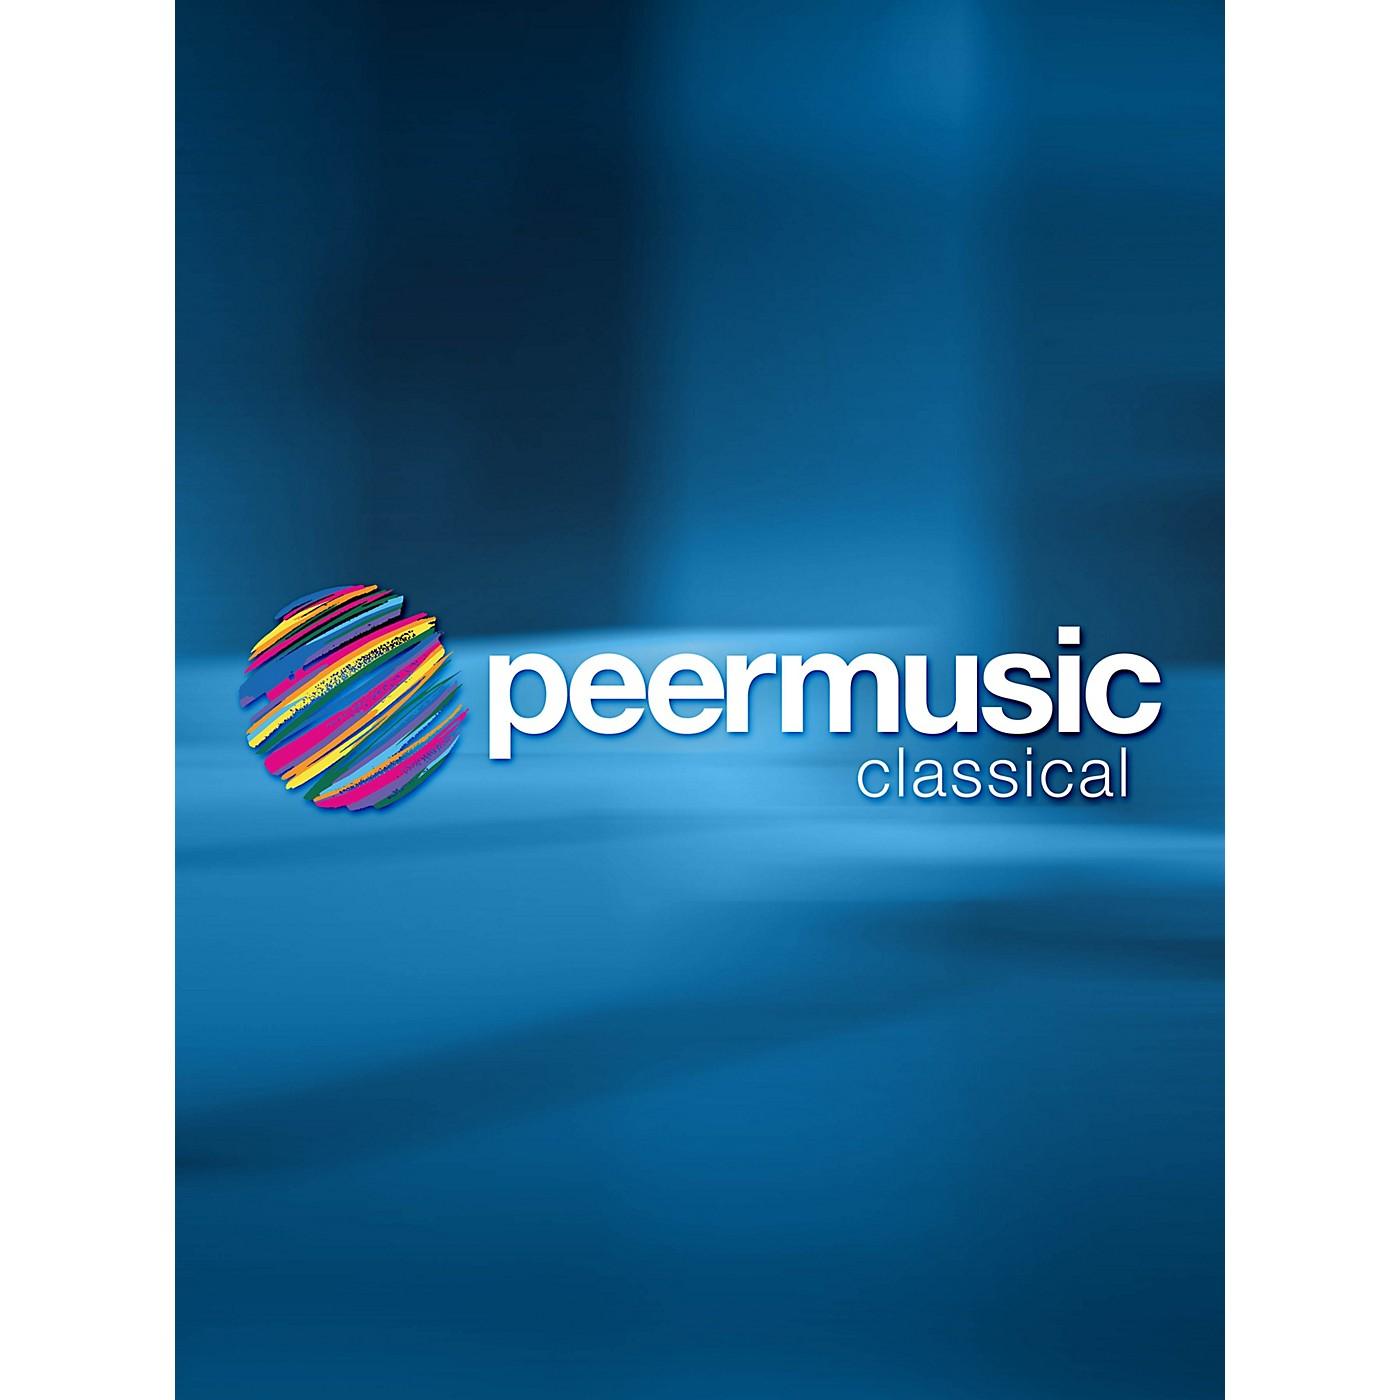 Peer Music 4 Stücke (Violin and Piano) Peermusic Classical Series Softcover thumbnail